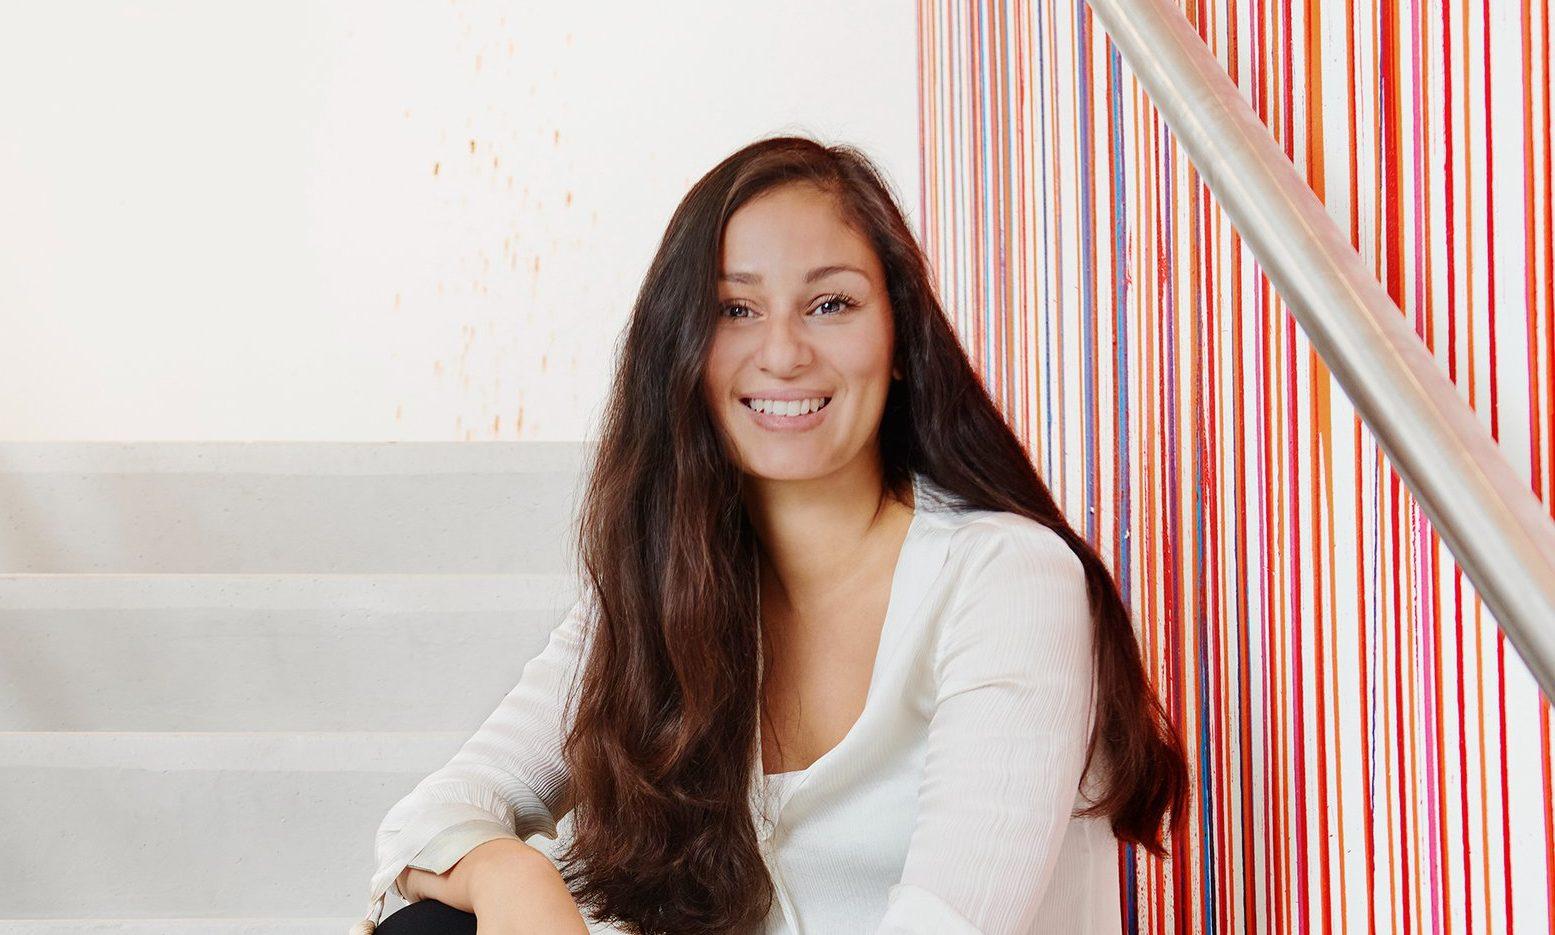 Indra Sharma (ex EQT and Bambora) joins Peak as Partner, opening Peak's Stockholm office